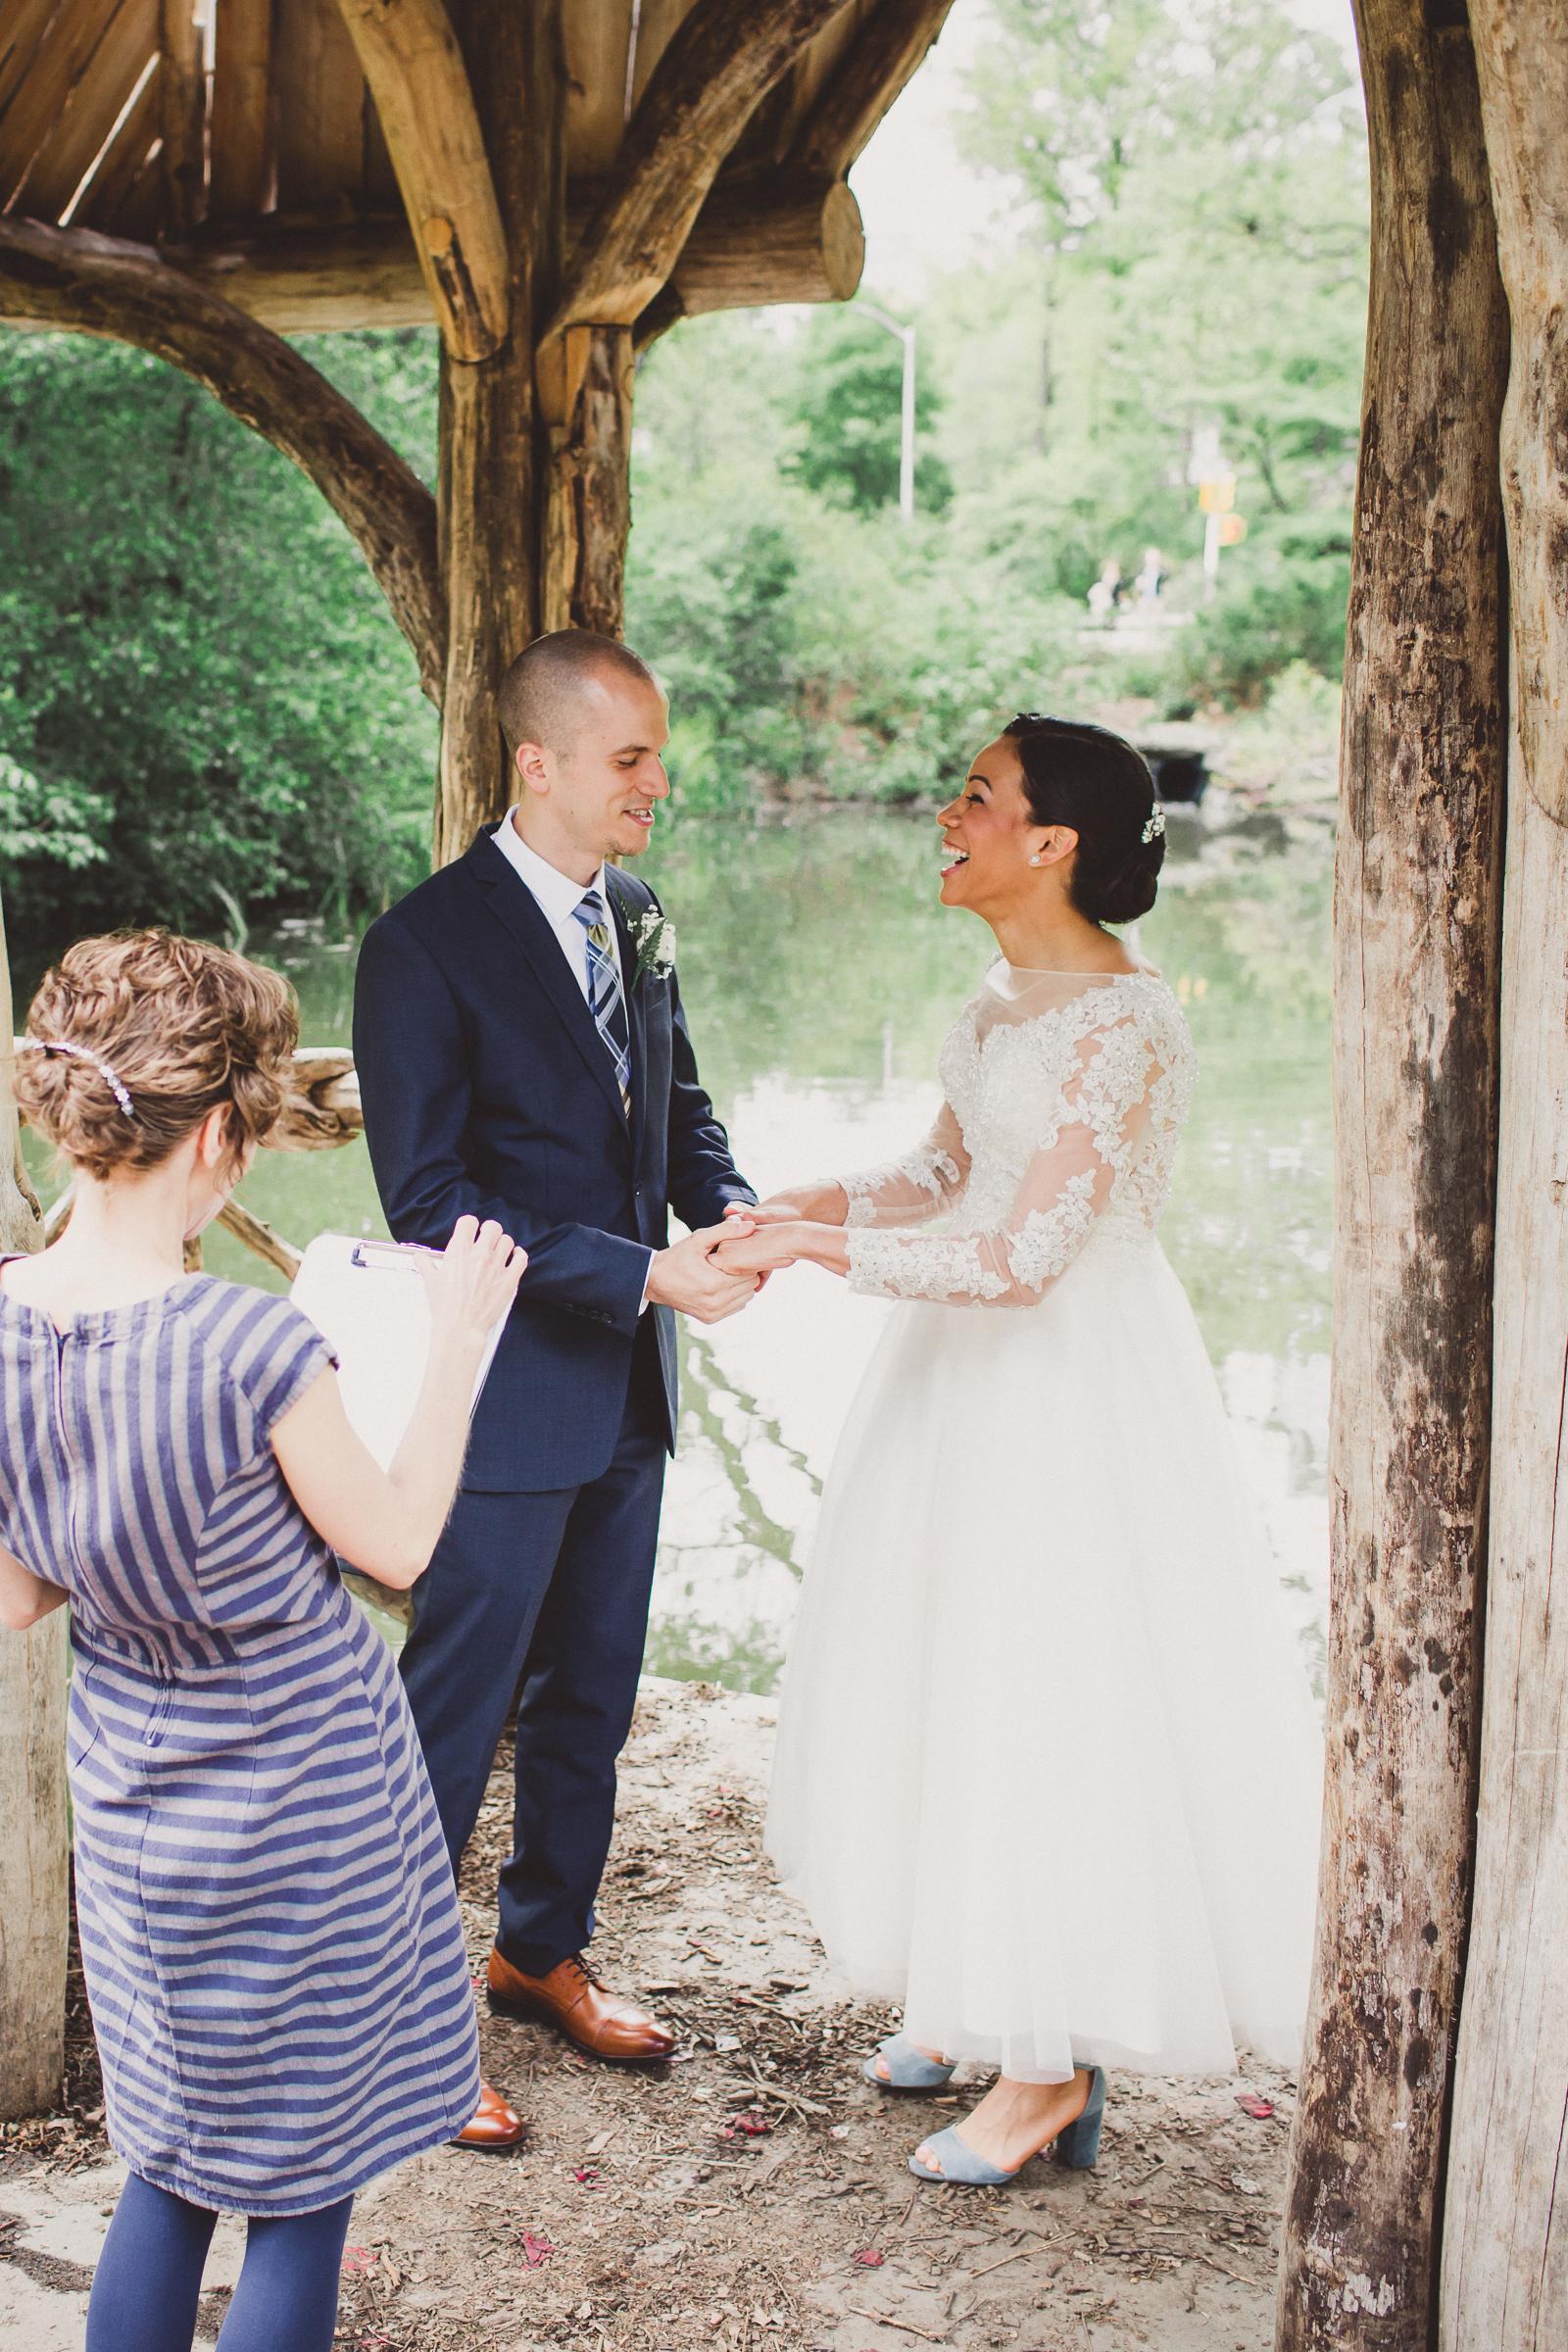 Wagner-Cove-Central-Park-Elopement-New-York-Documentary-Wedding-Photographer-1.jpg